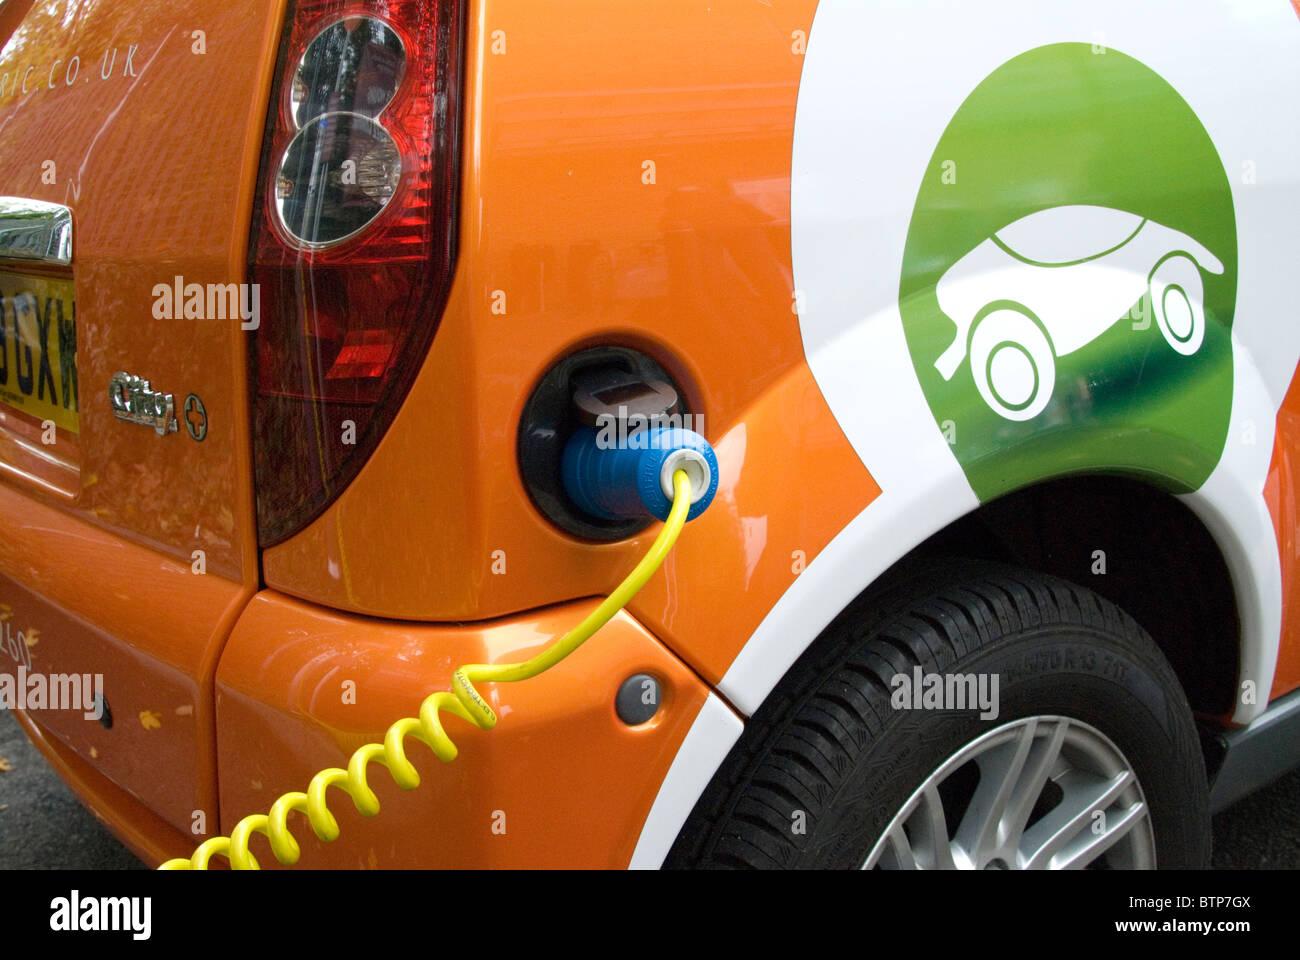 Mujer de enchufar un coche eléctrico alquilados a GoGo automóviles eléctricos EV gratis punto de Imagen De Stock